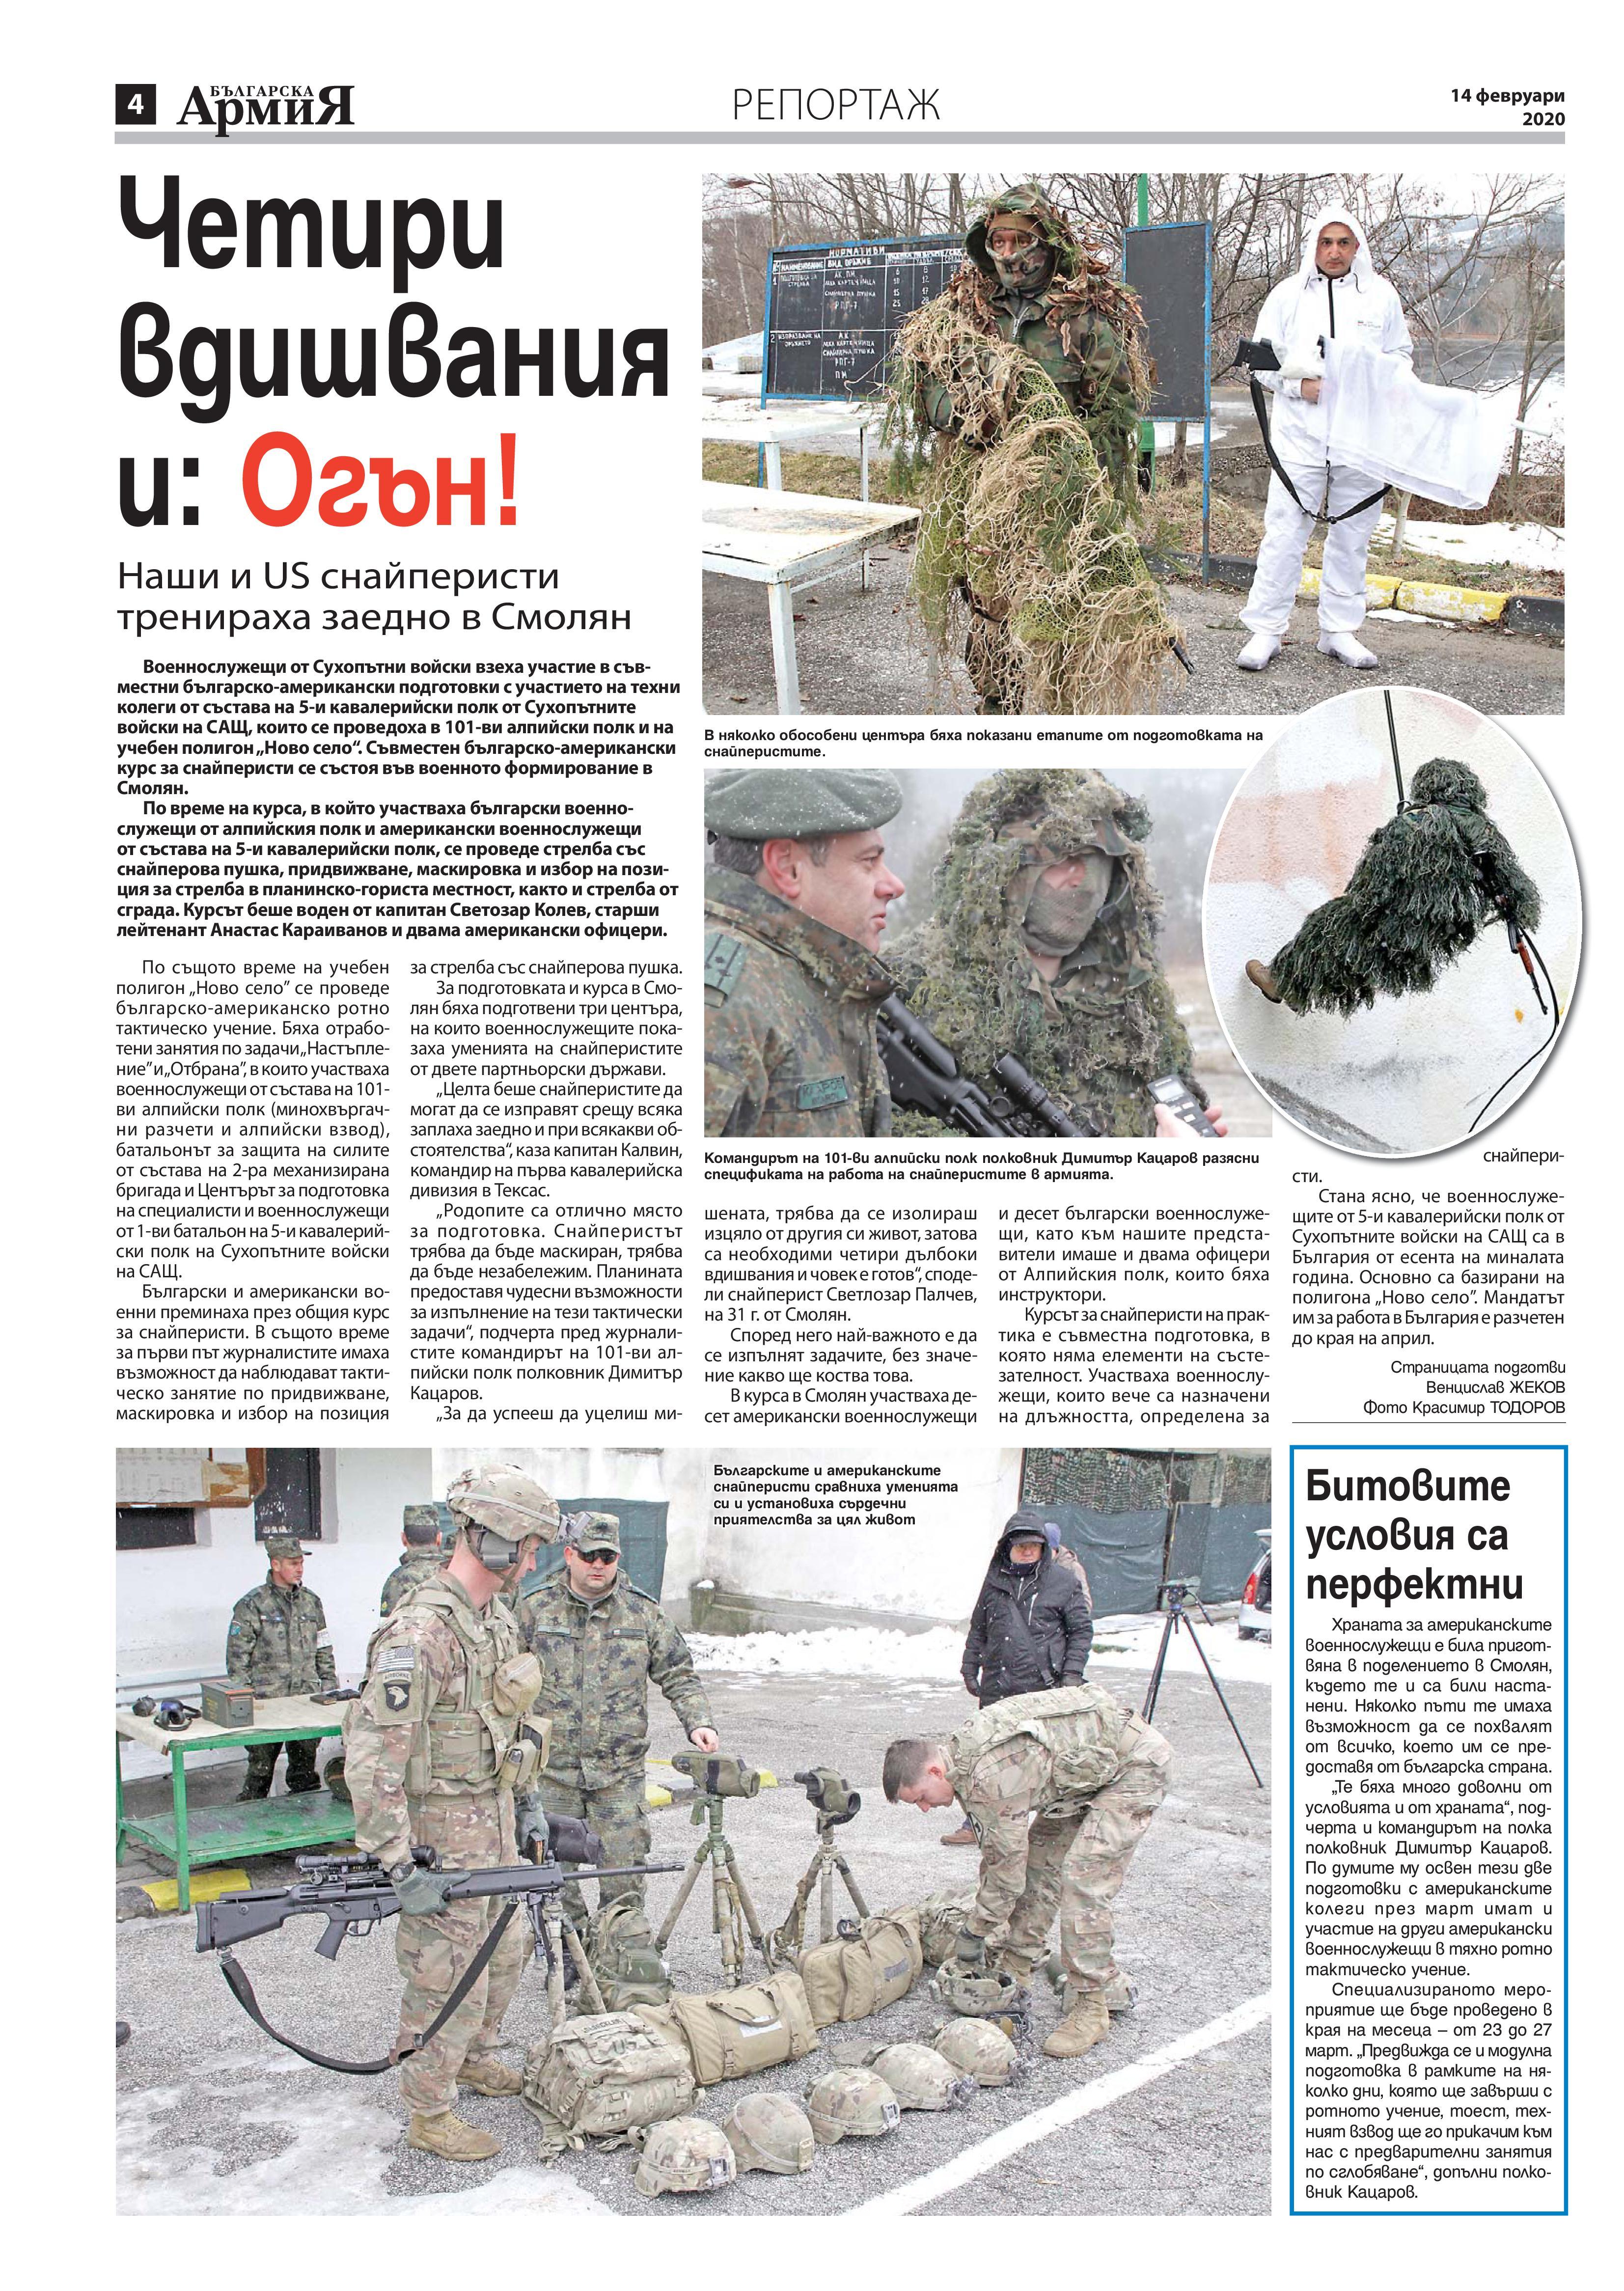 https://www.armymedia.bg/wp-content/uploads/2015/06/04-34.jpg